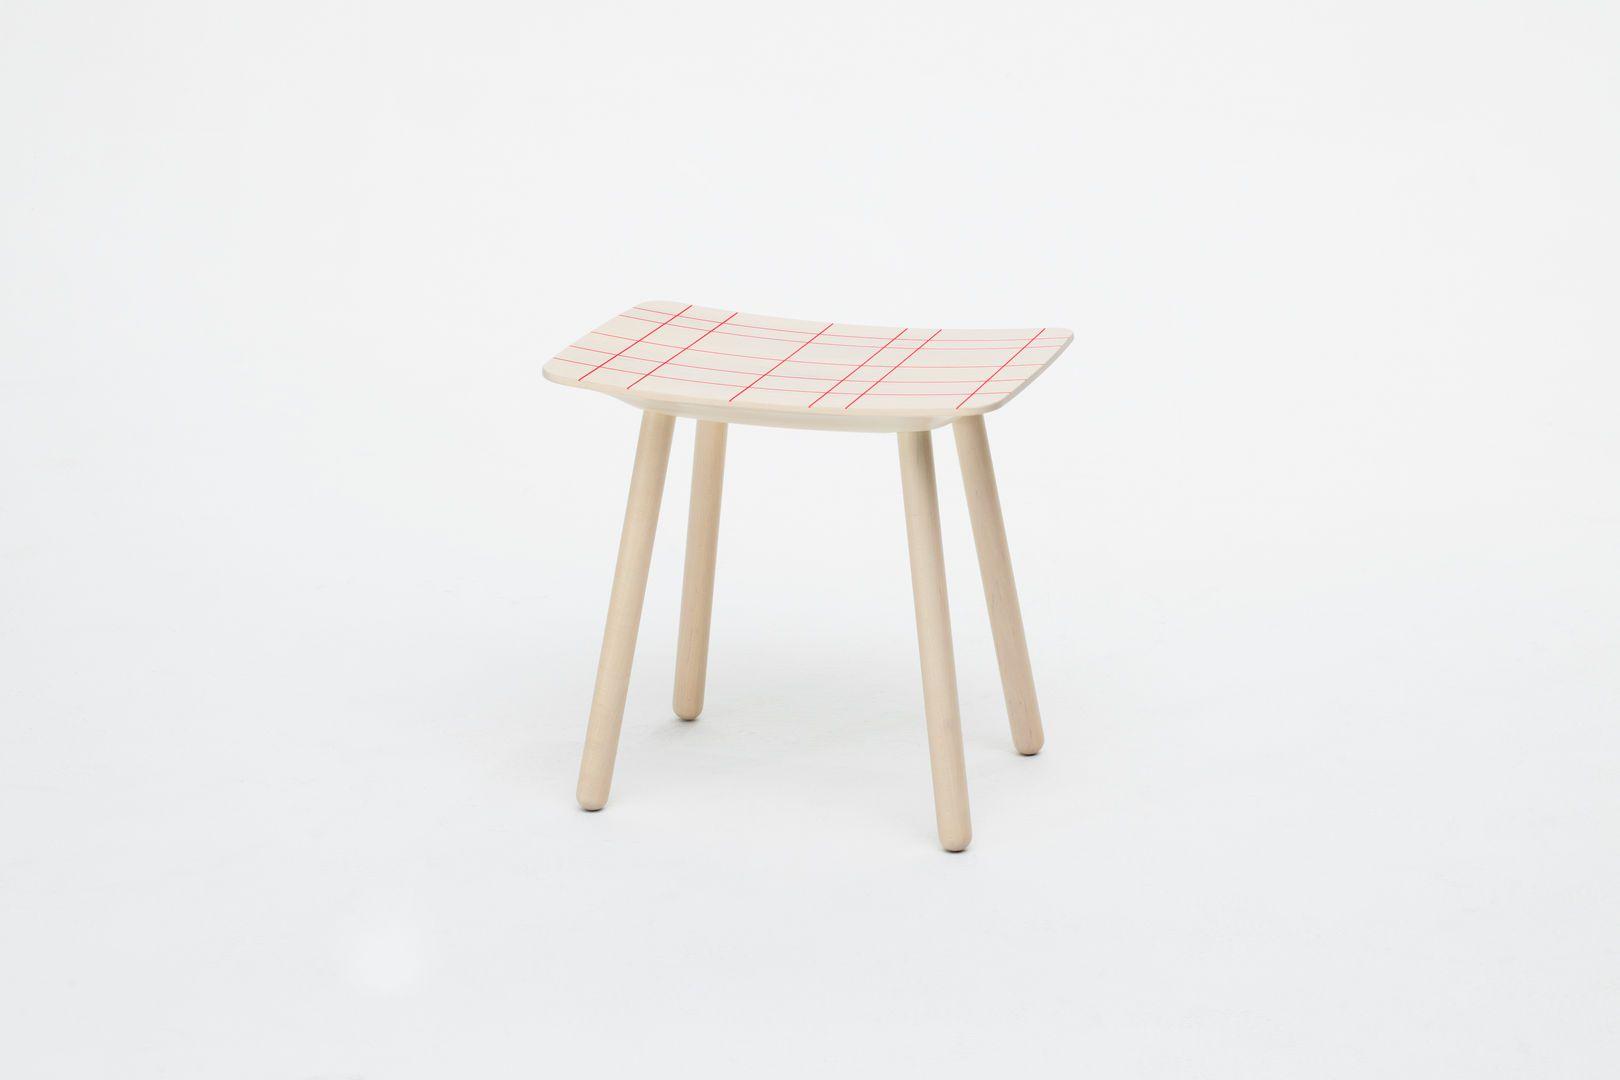 Colour stool by scholten & baijings for karimoku new standard